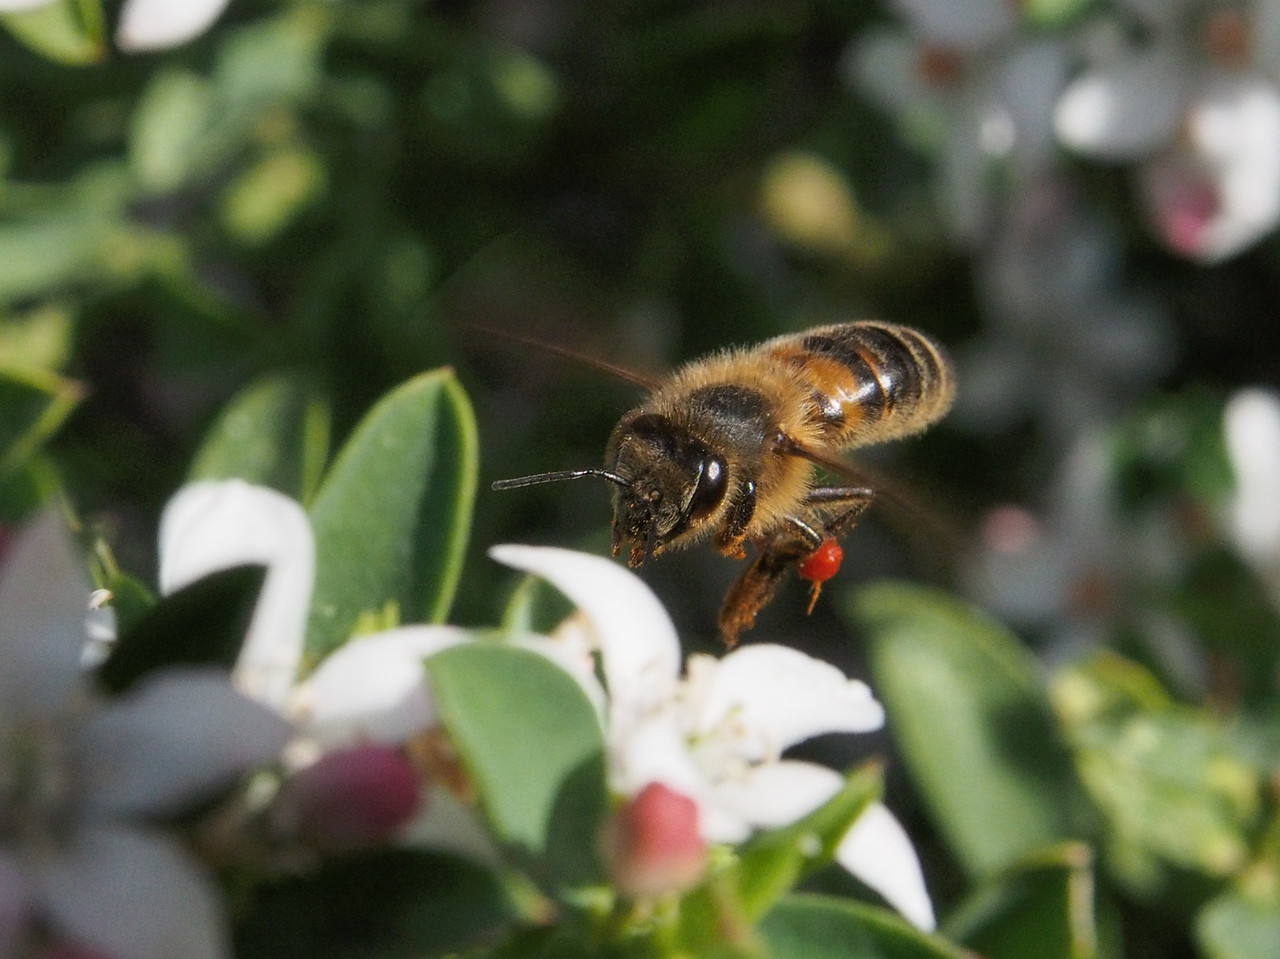 20130901_1214_0571 Kew Baptist bee